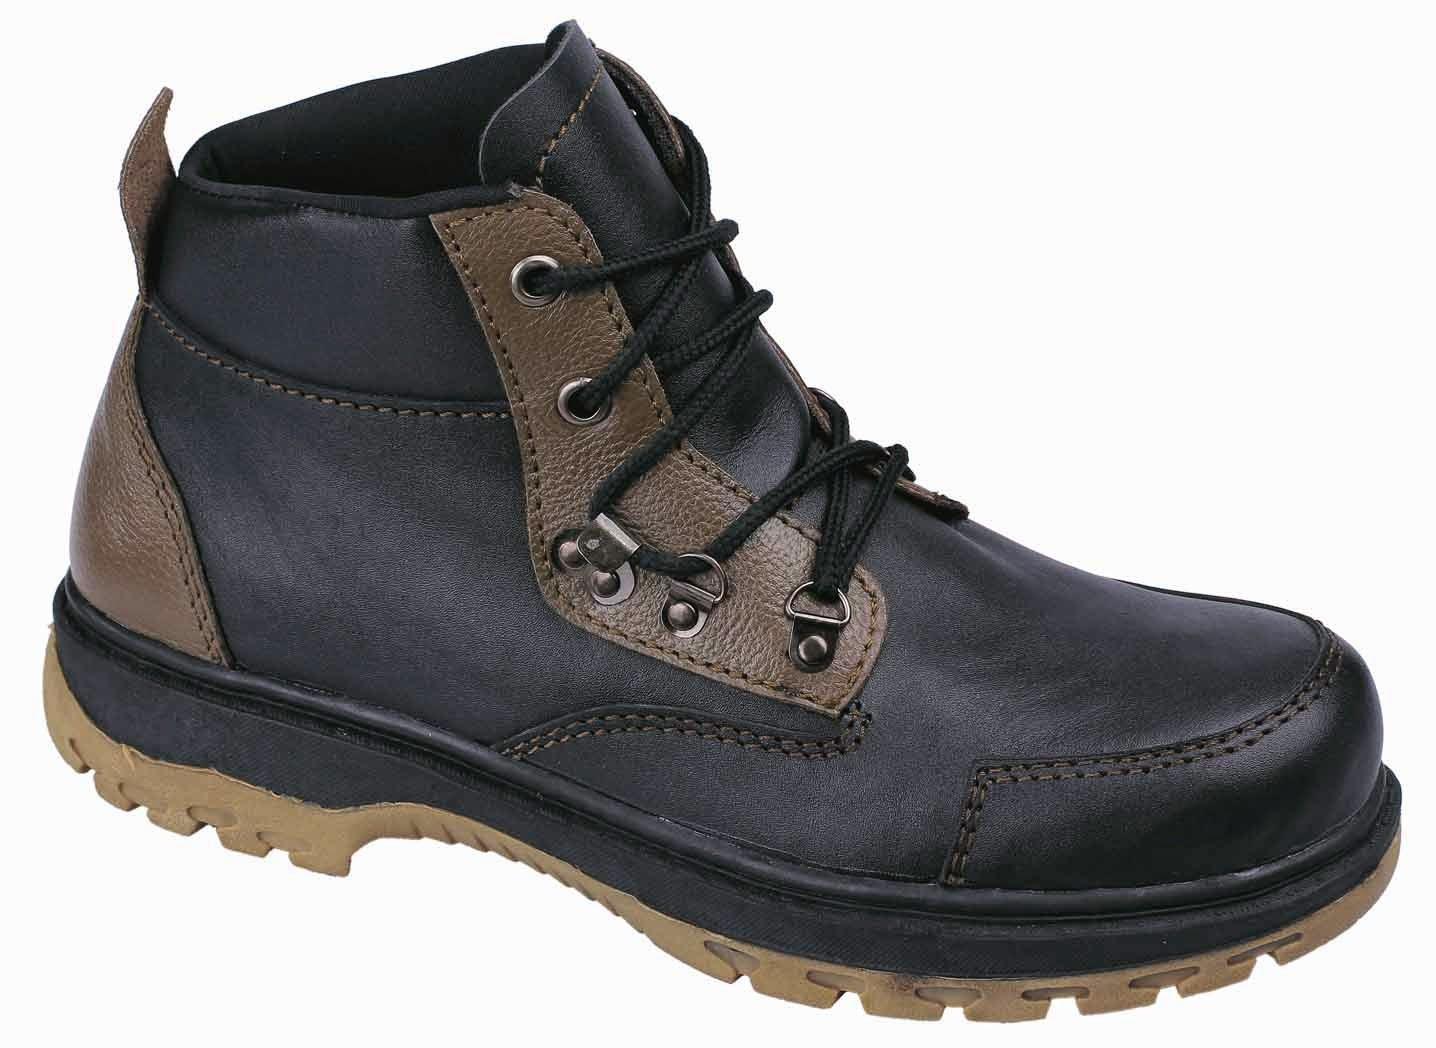 Jual sepatu safety murah, model sepatu safety trendy, sepatu safety cibaduyut murah, sepatu online model safety